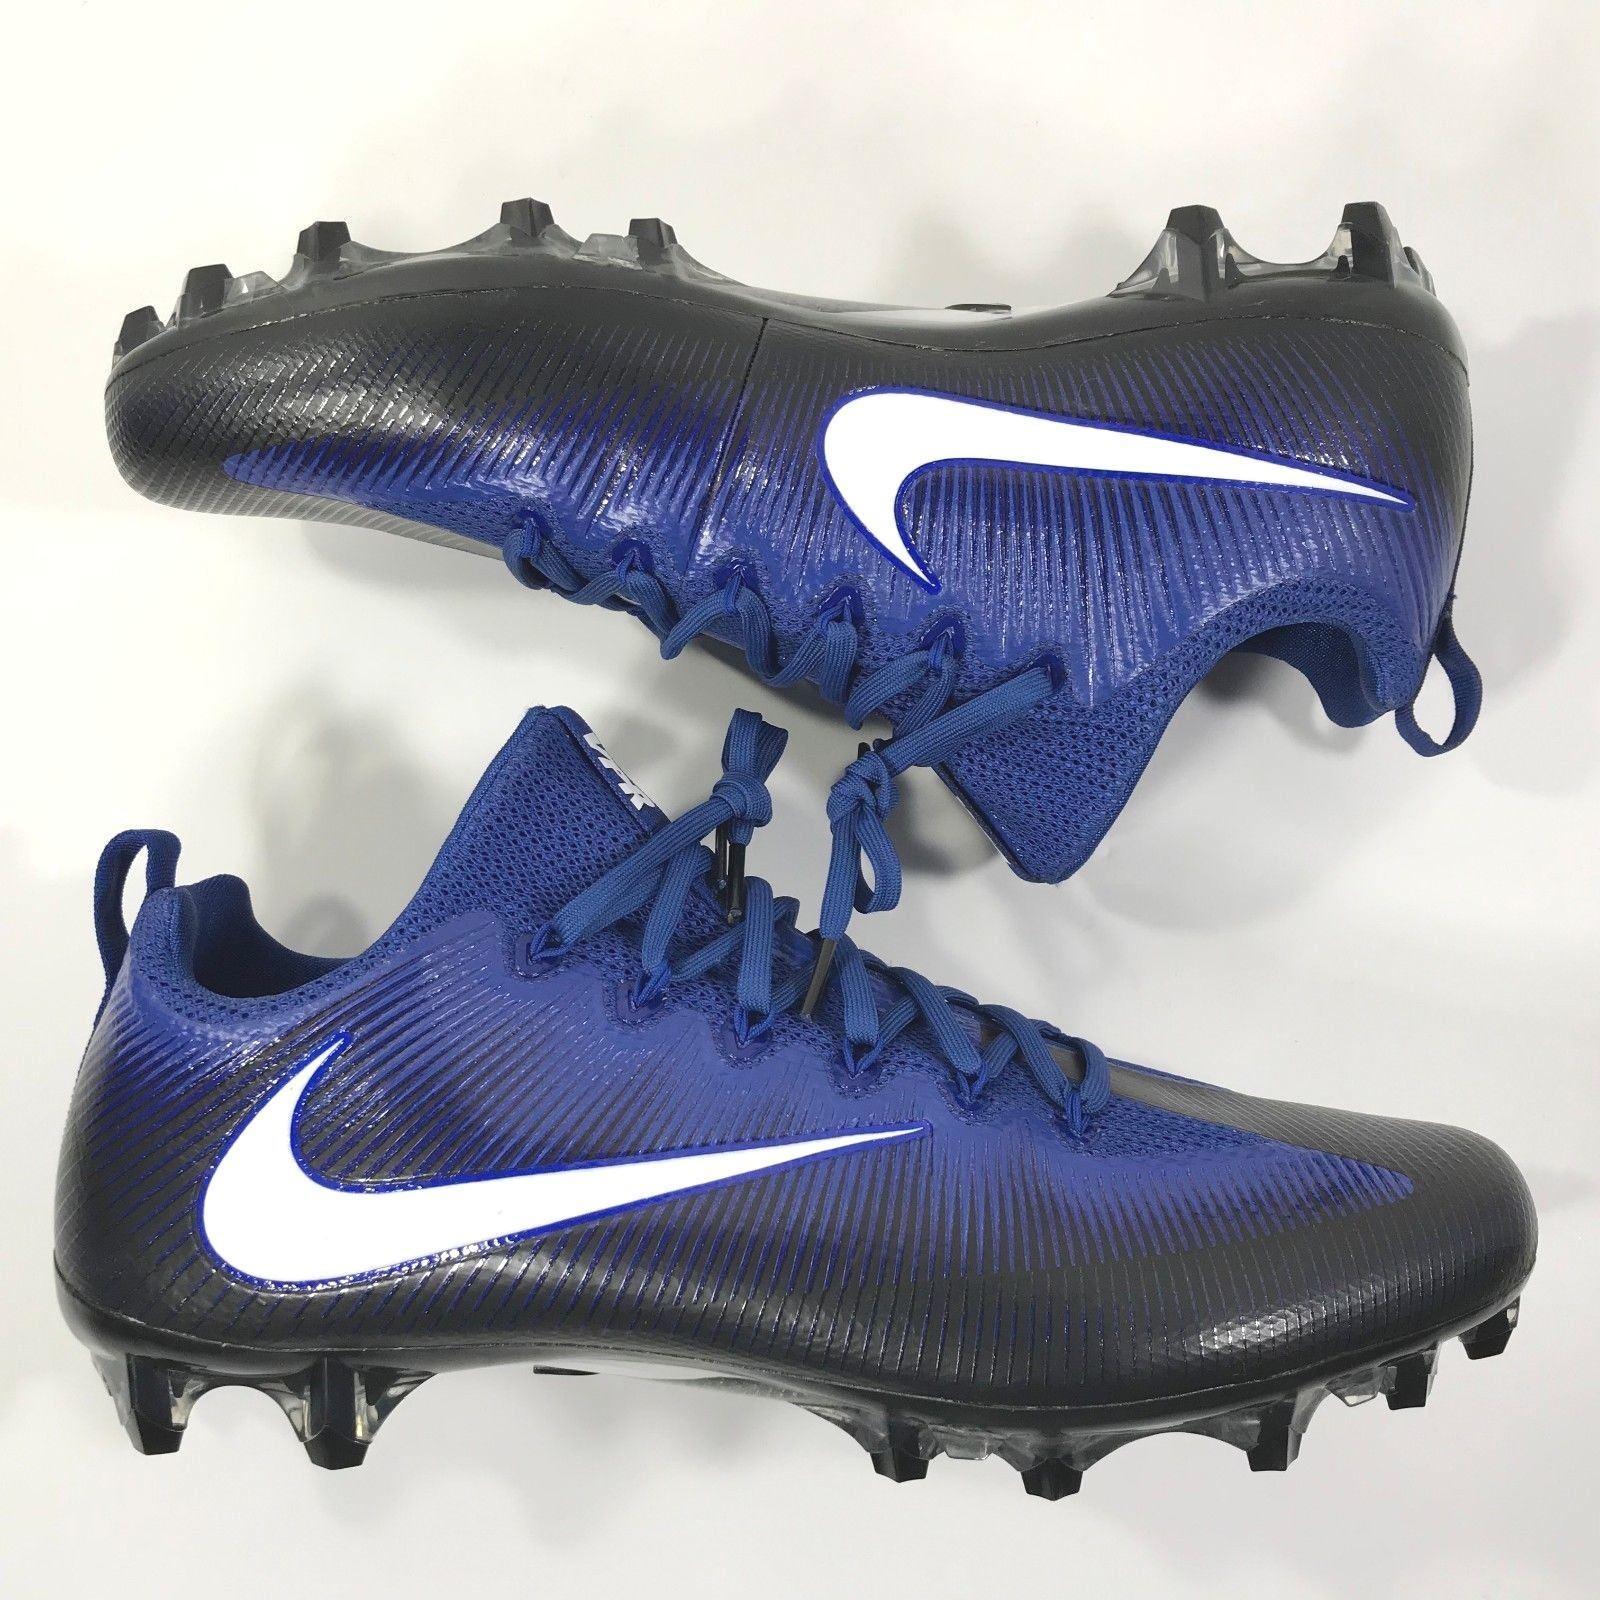 277deb4bef69 $120 New Nike Vapor Untouchable Pro PF Football Cleats Blue 839924-014 Size  14